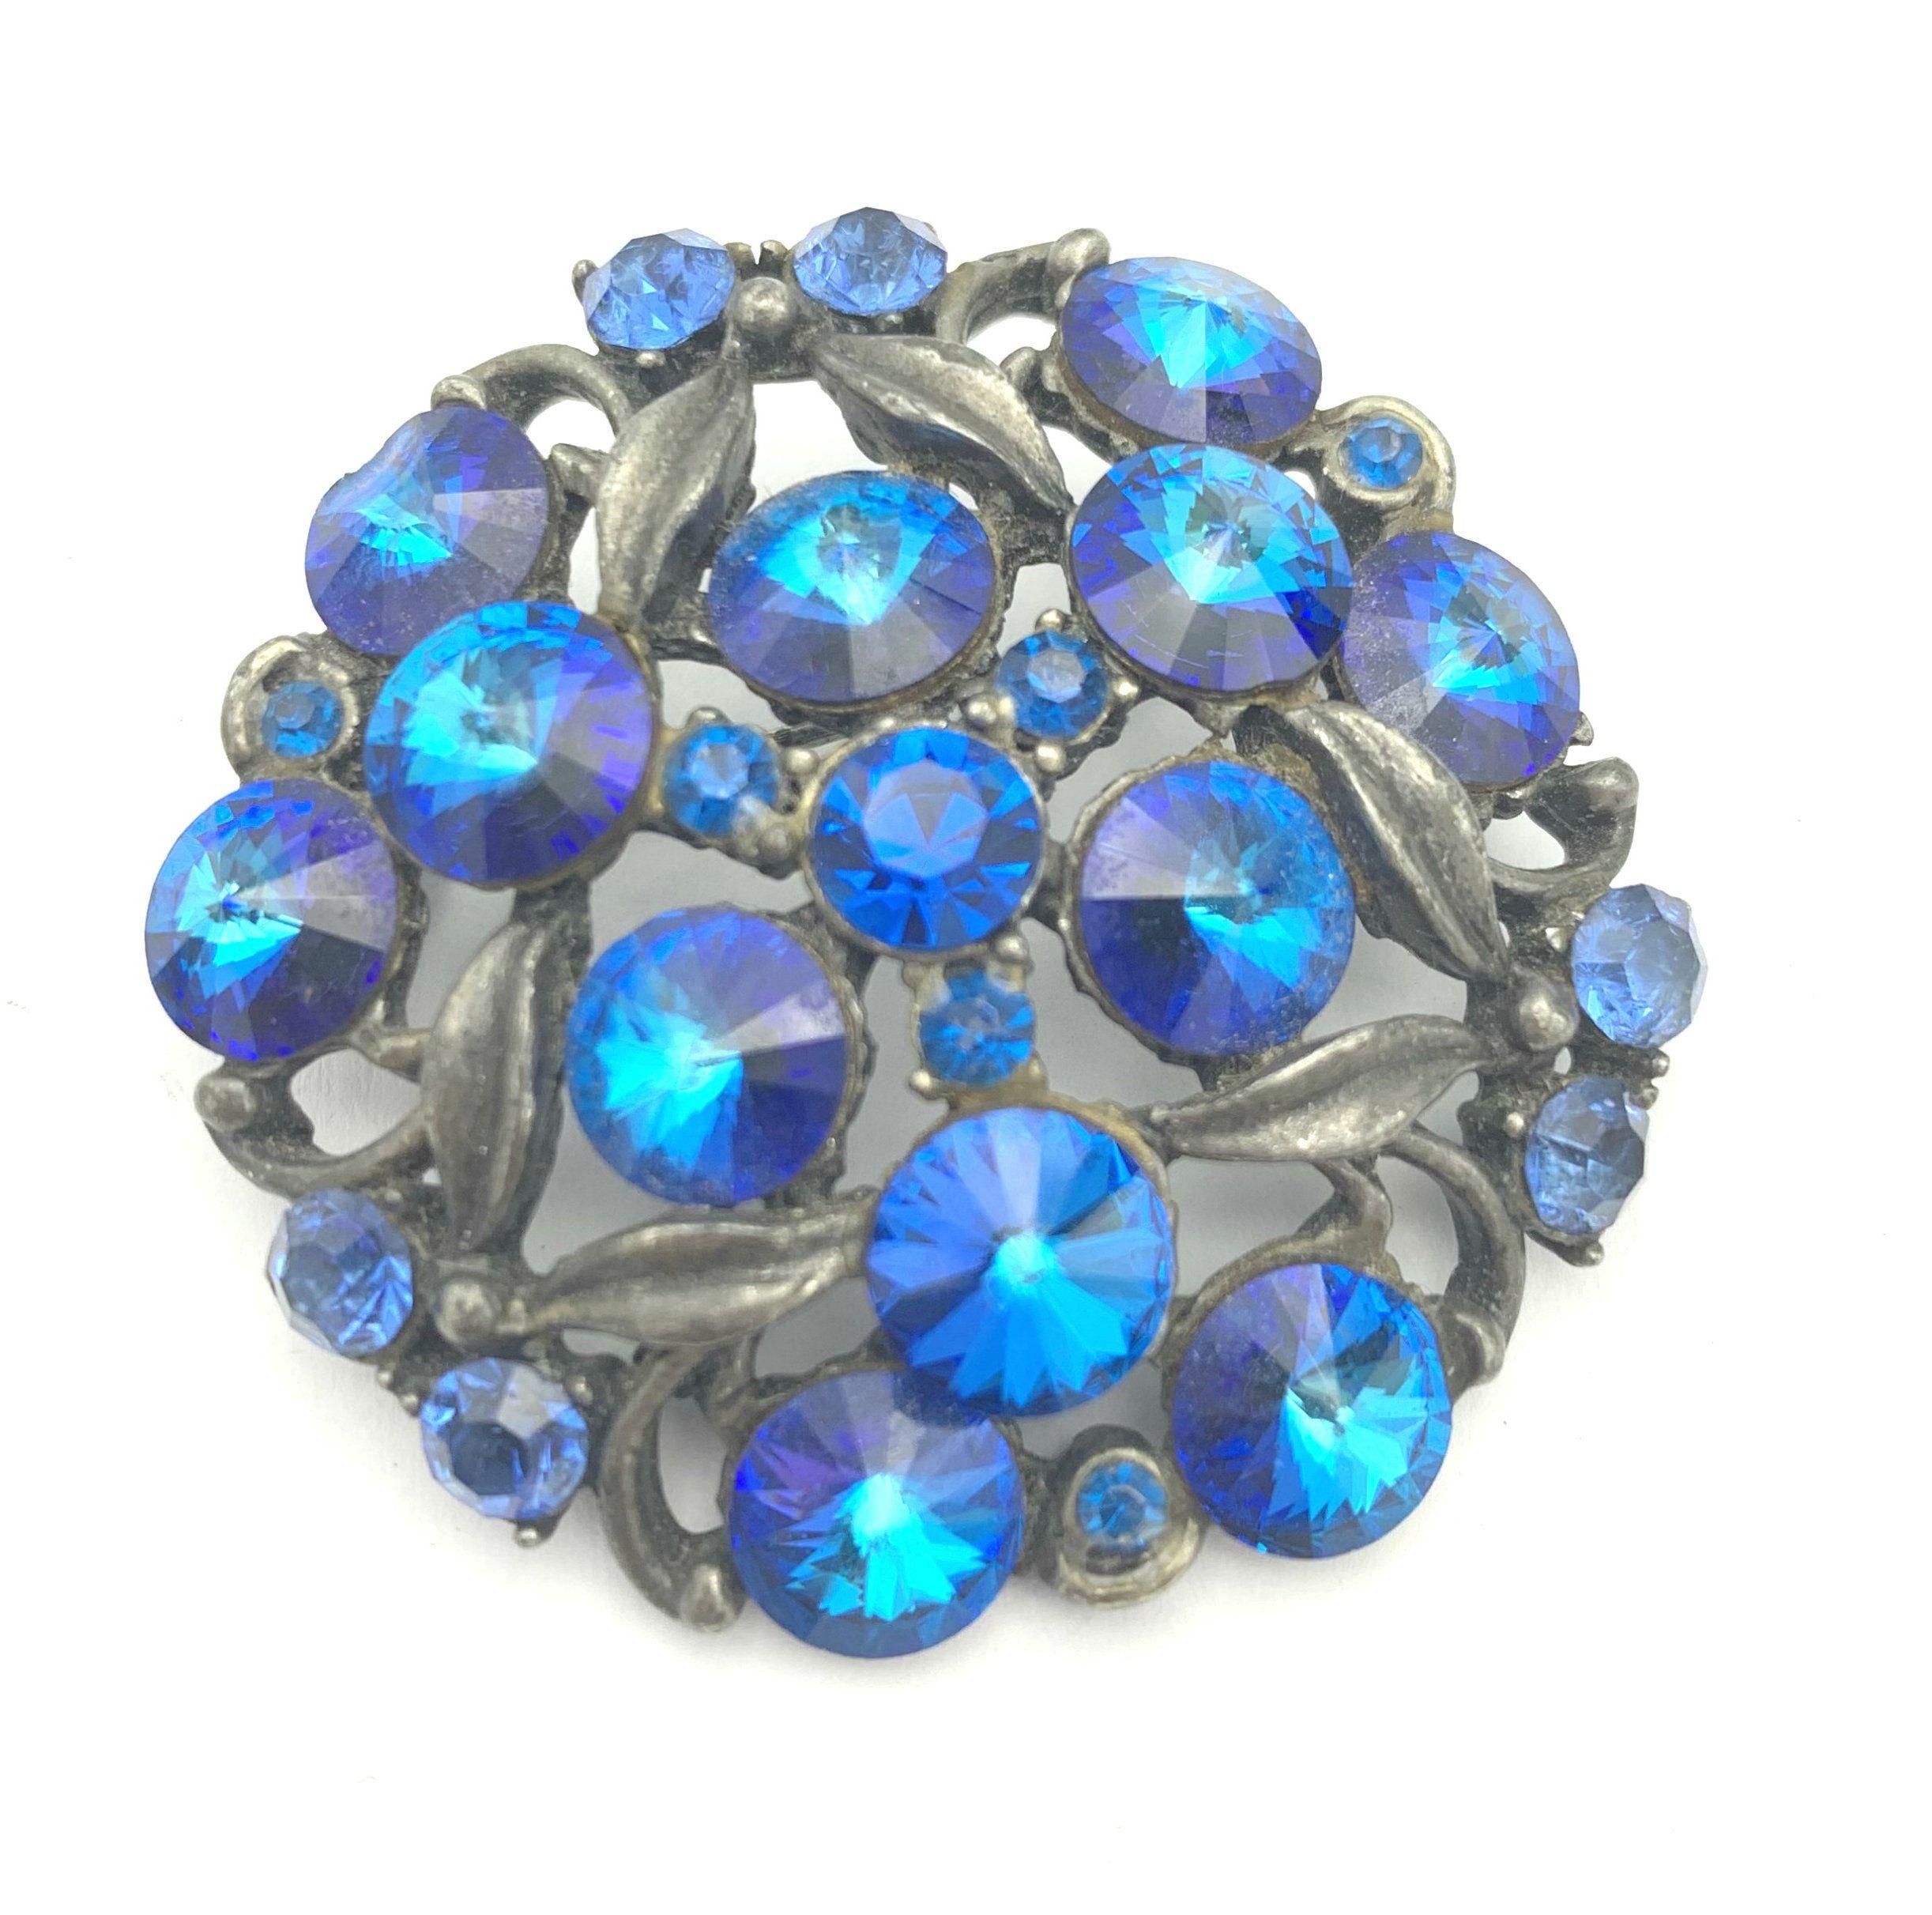 eurasia Handmade Oval Shape Peanut Wood Jasper Gemstone Silver Plated Cuff Bracelet